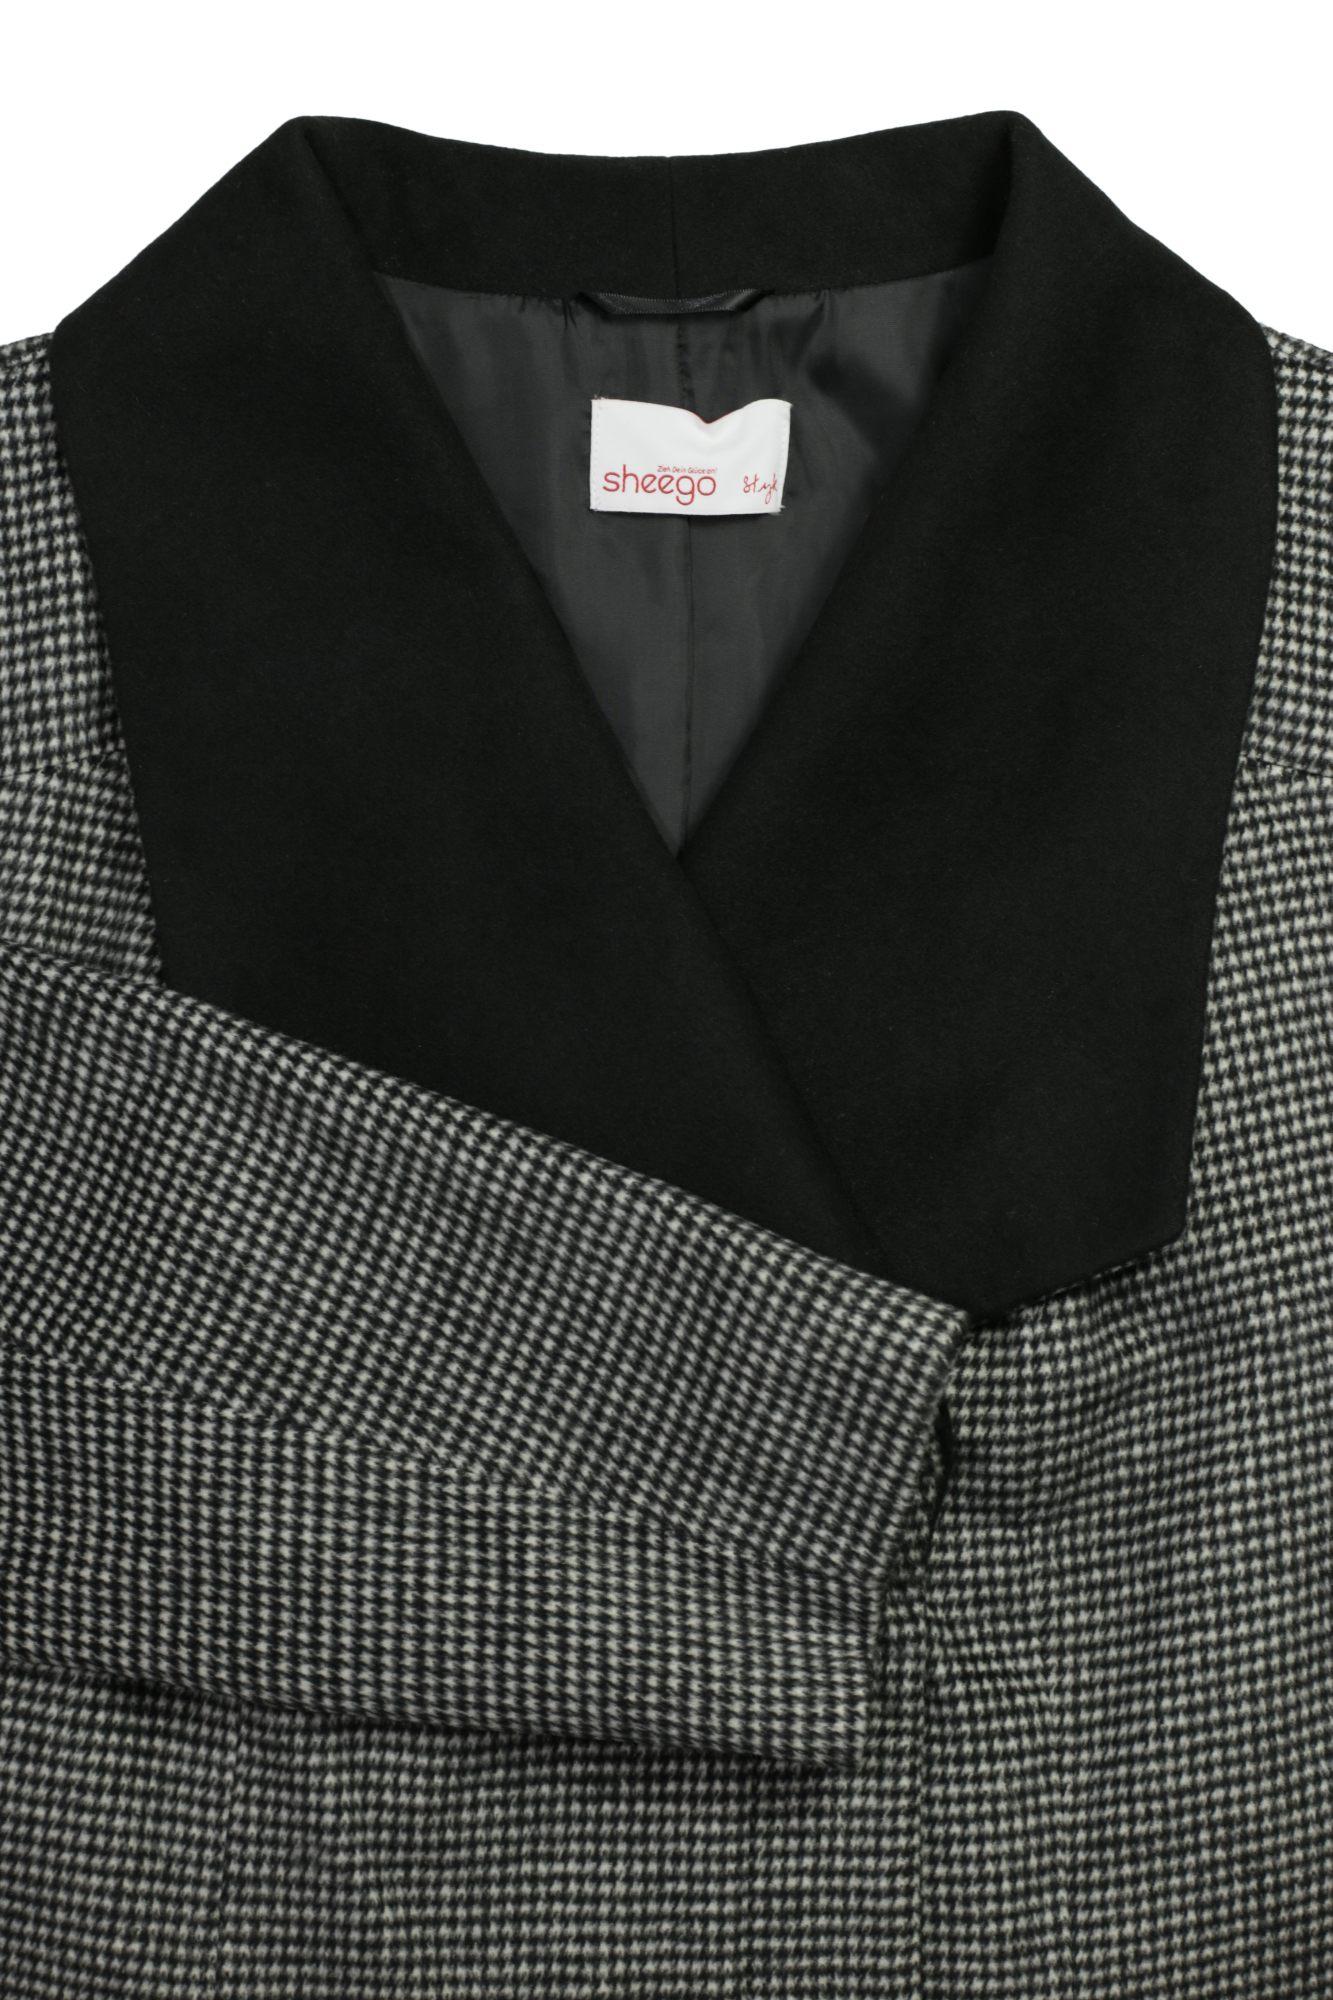 Kleidung & Accessoires sheego Kurzmantel Mantel Wintermantel